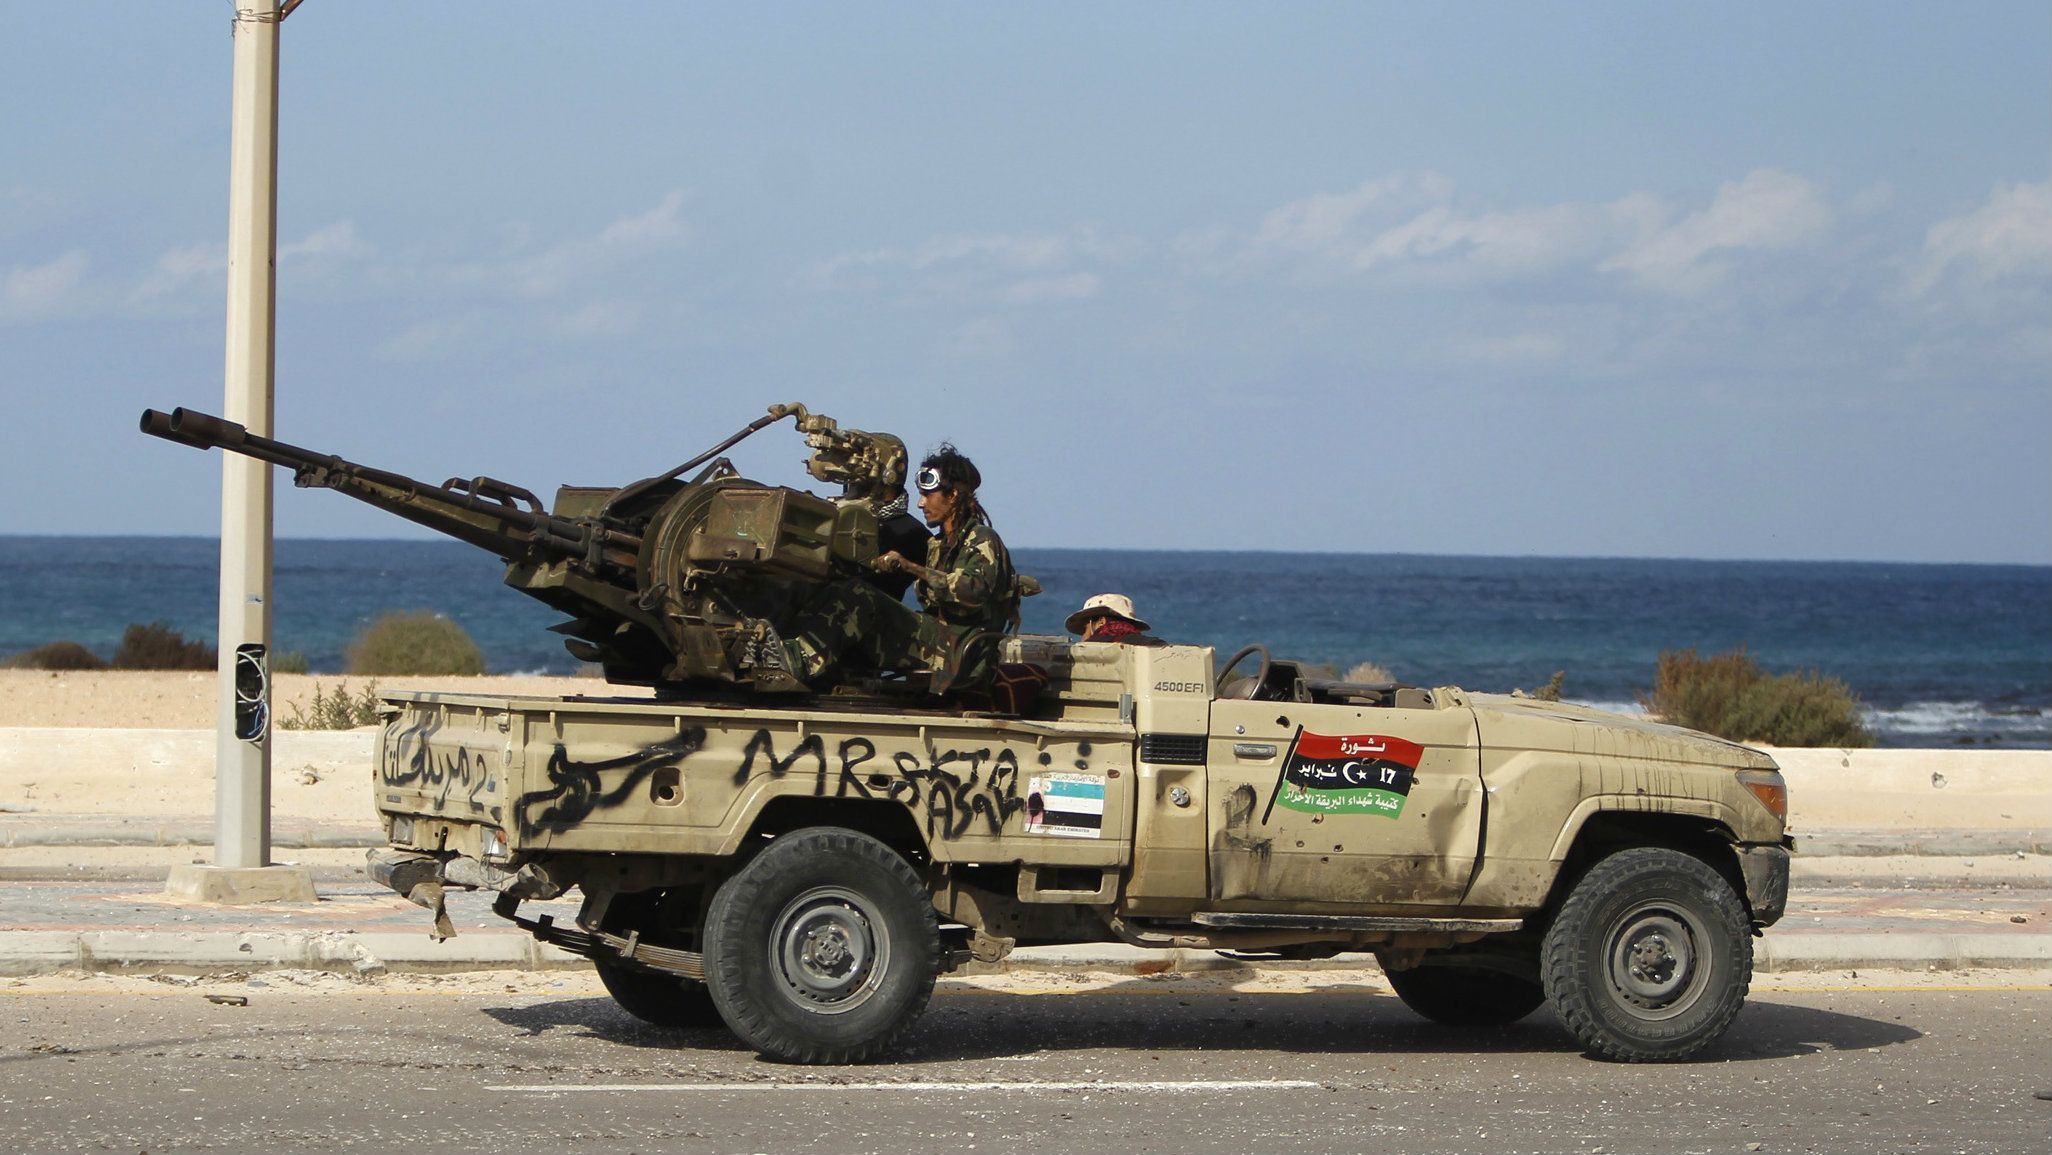 In Libya, You Can Buy Anti-Aircraft Gun on Facebook, In Libya, You Can Buy Anti-Aircraft Gun on Facebook